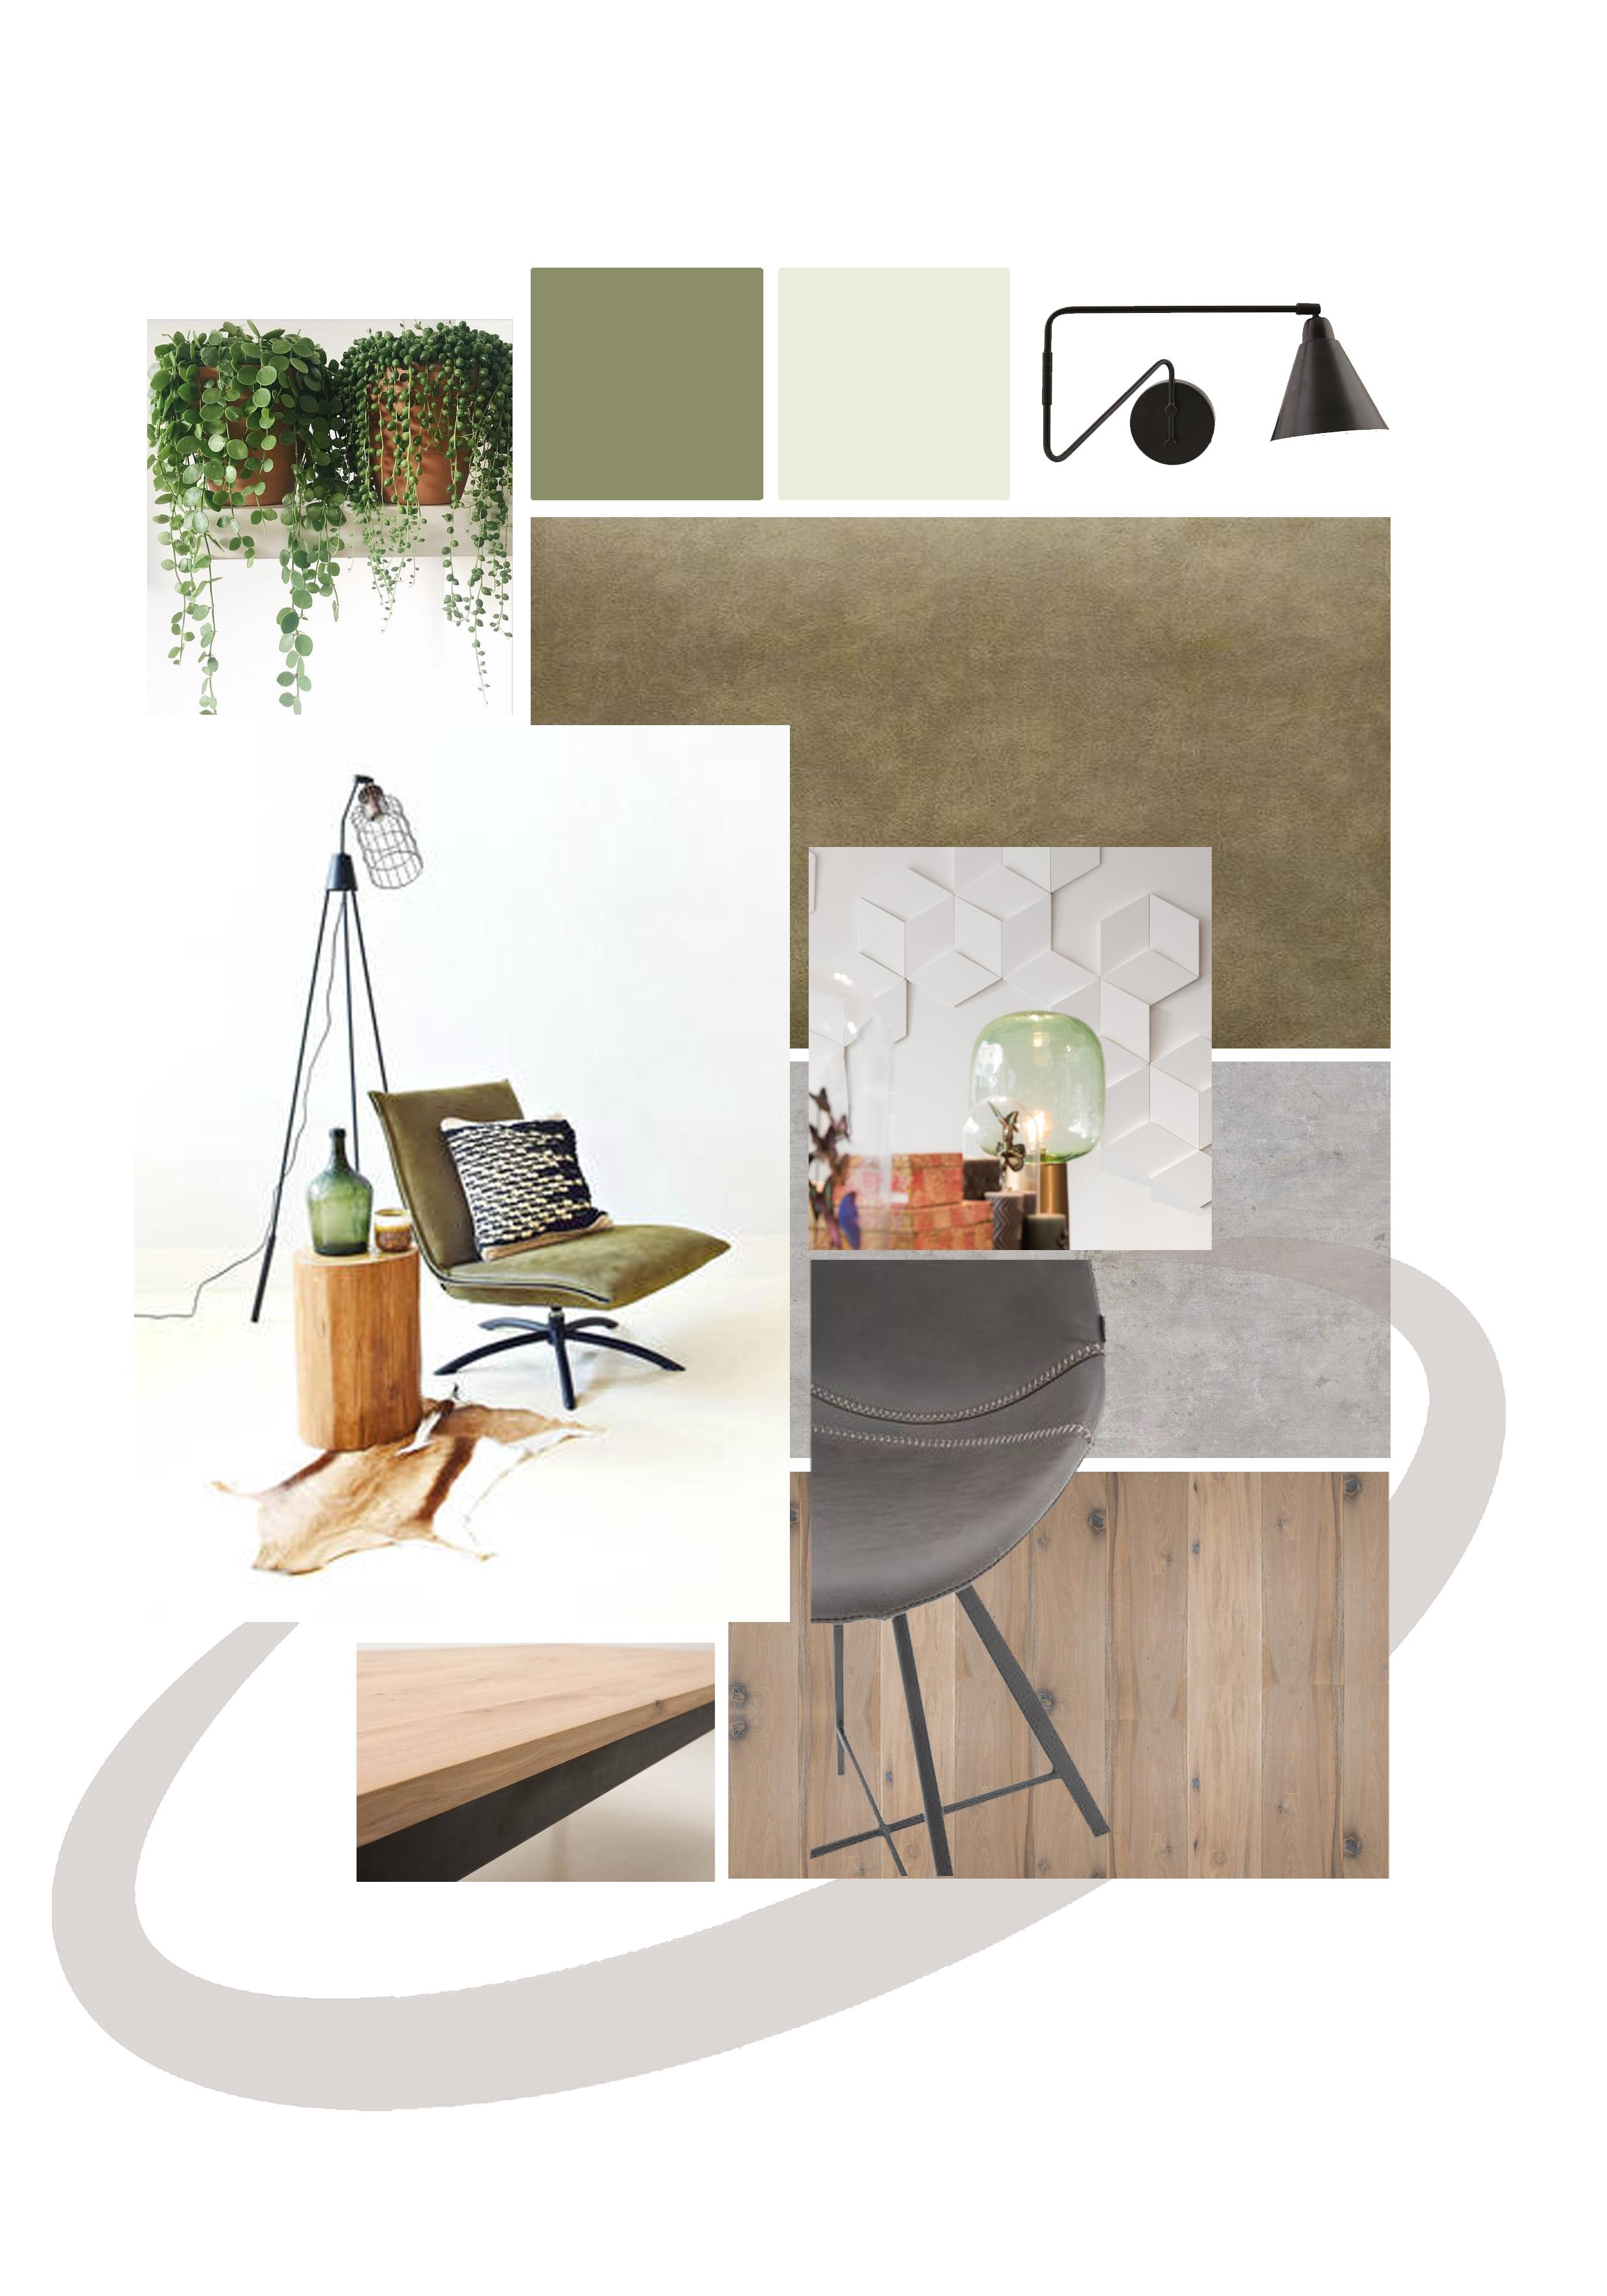 Thuis Ontwerp - styling - interieur - woning verkoop - thuis - interieuradvies - visualisatie